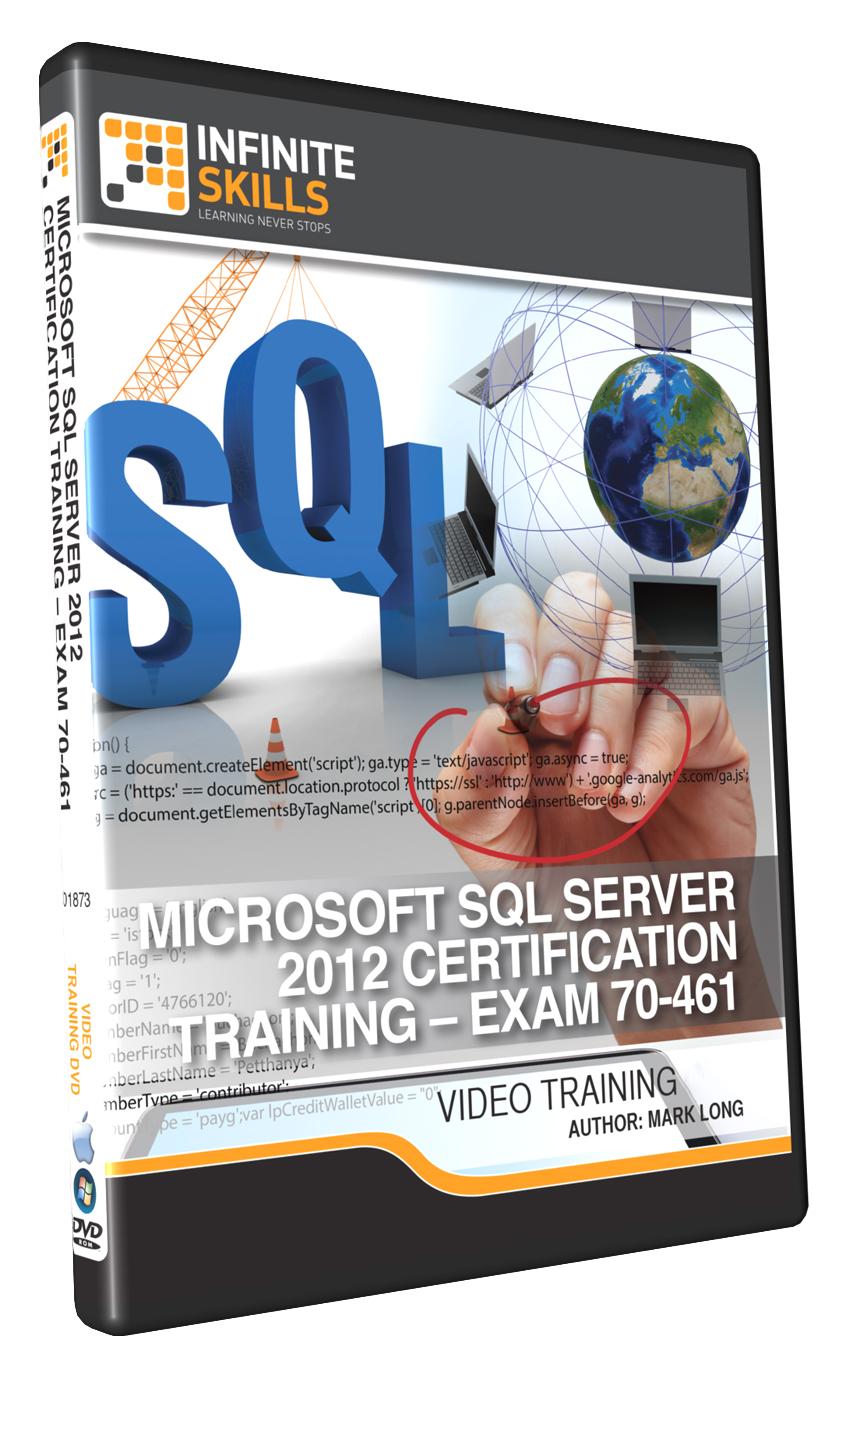 Infinite Skills Microsoft Sql Server 2012 Certification Exam 70